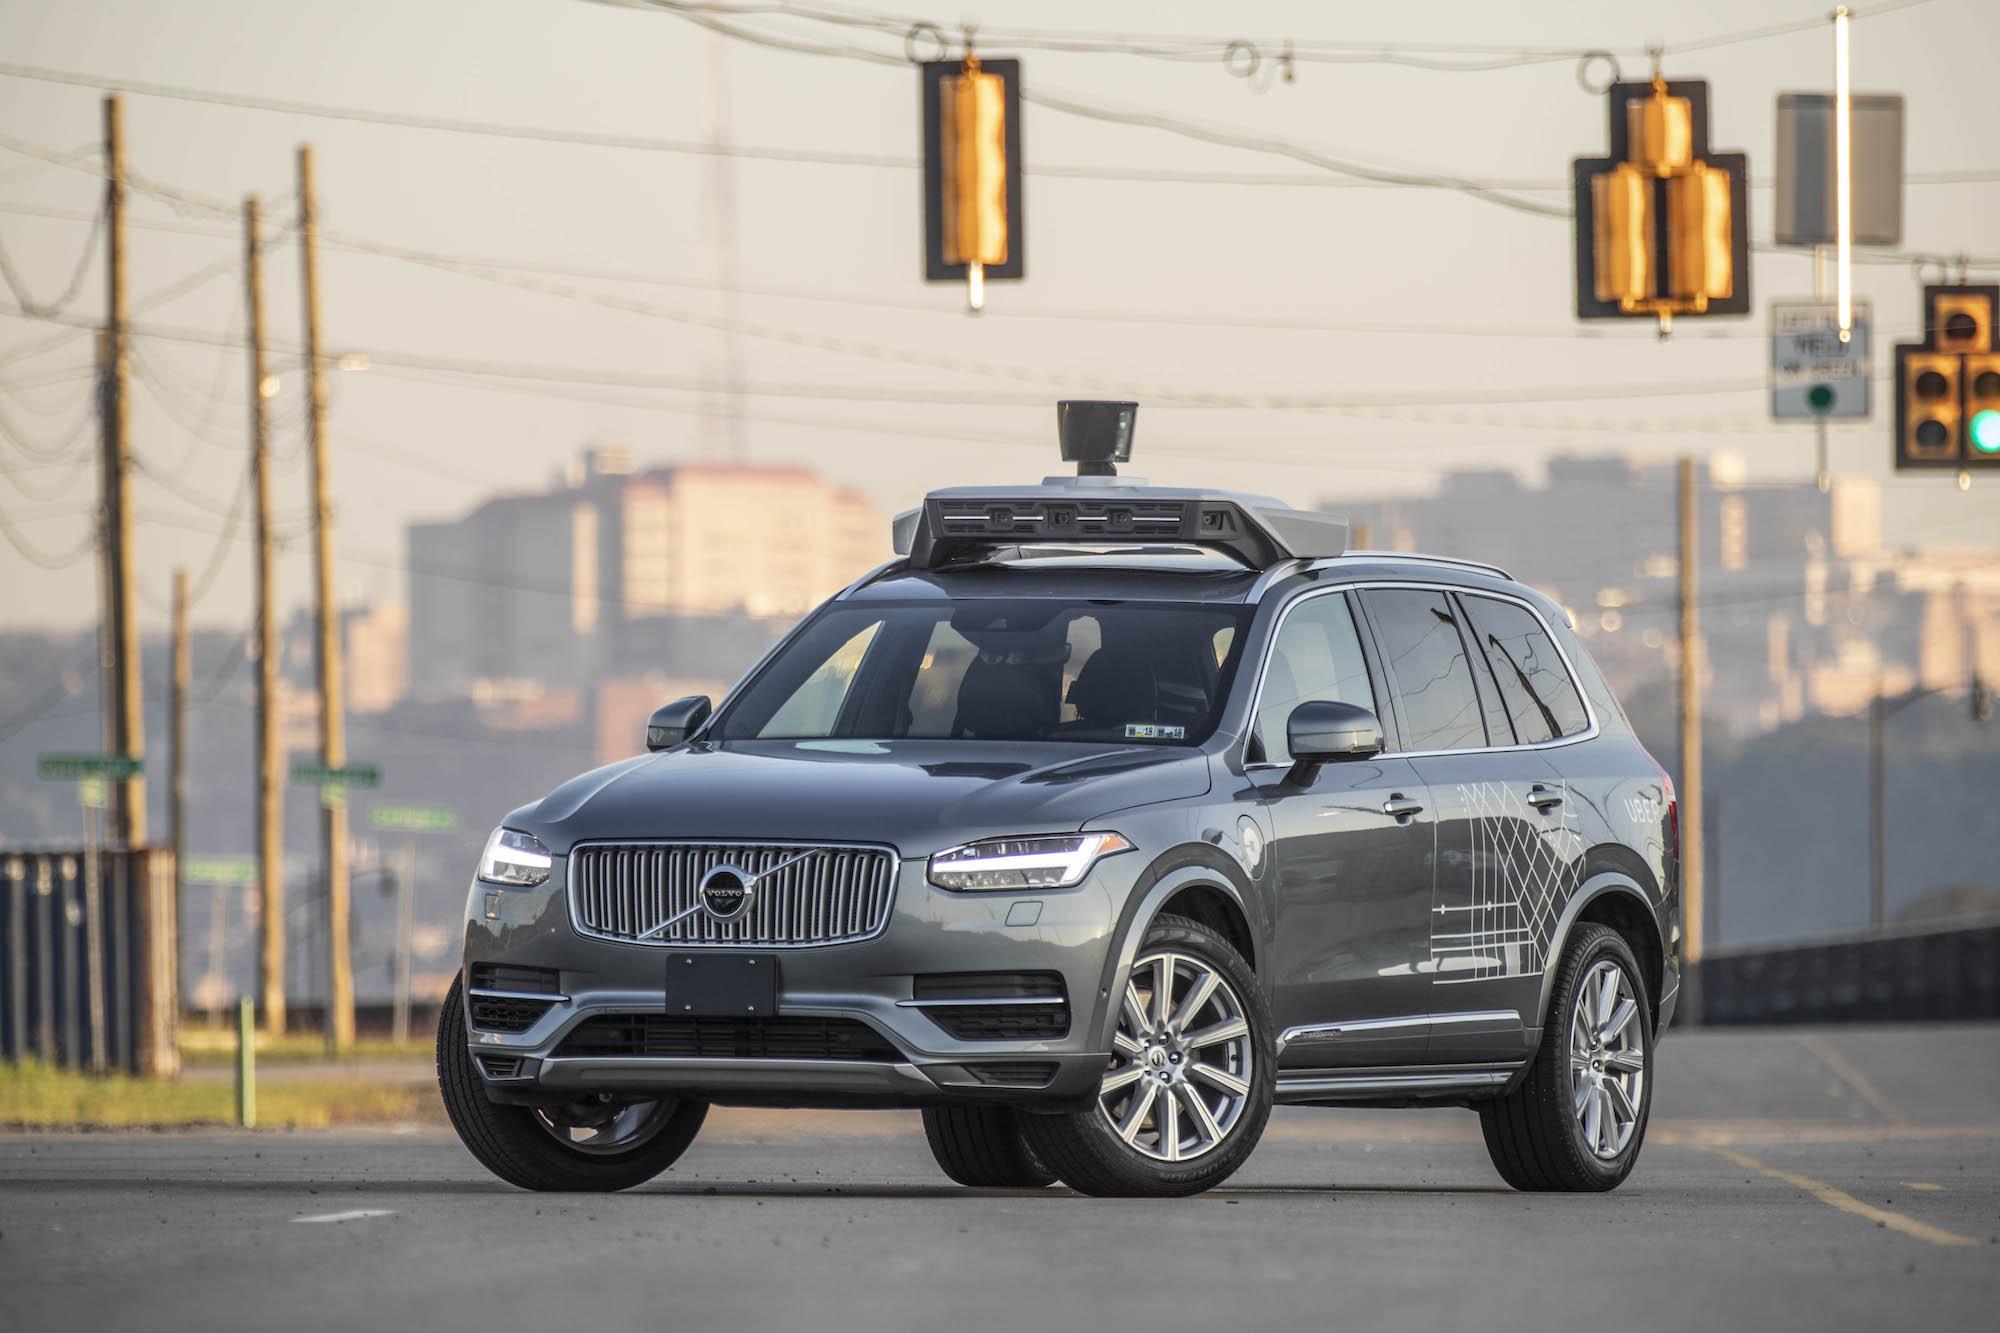 An autonomous SUV with Uber branding.